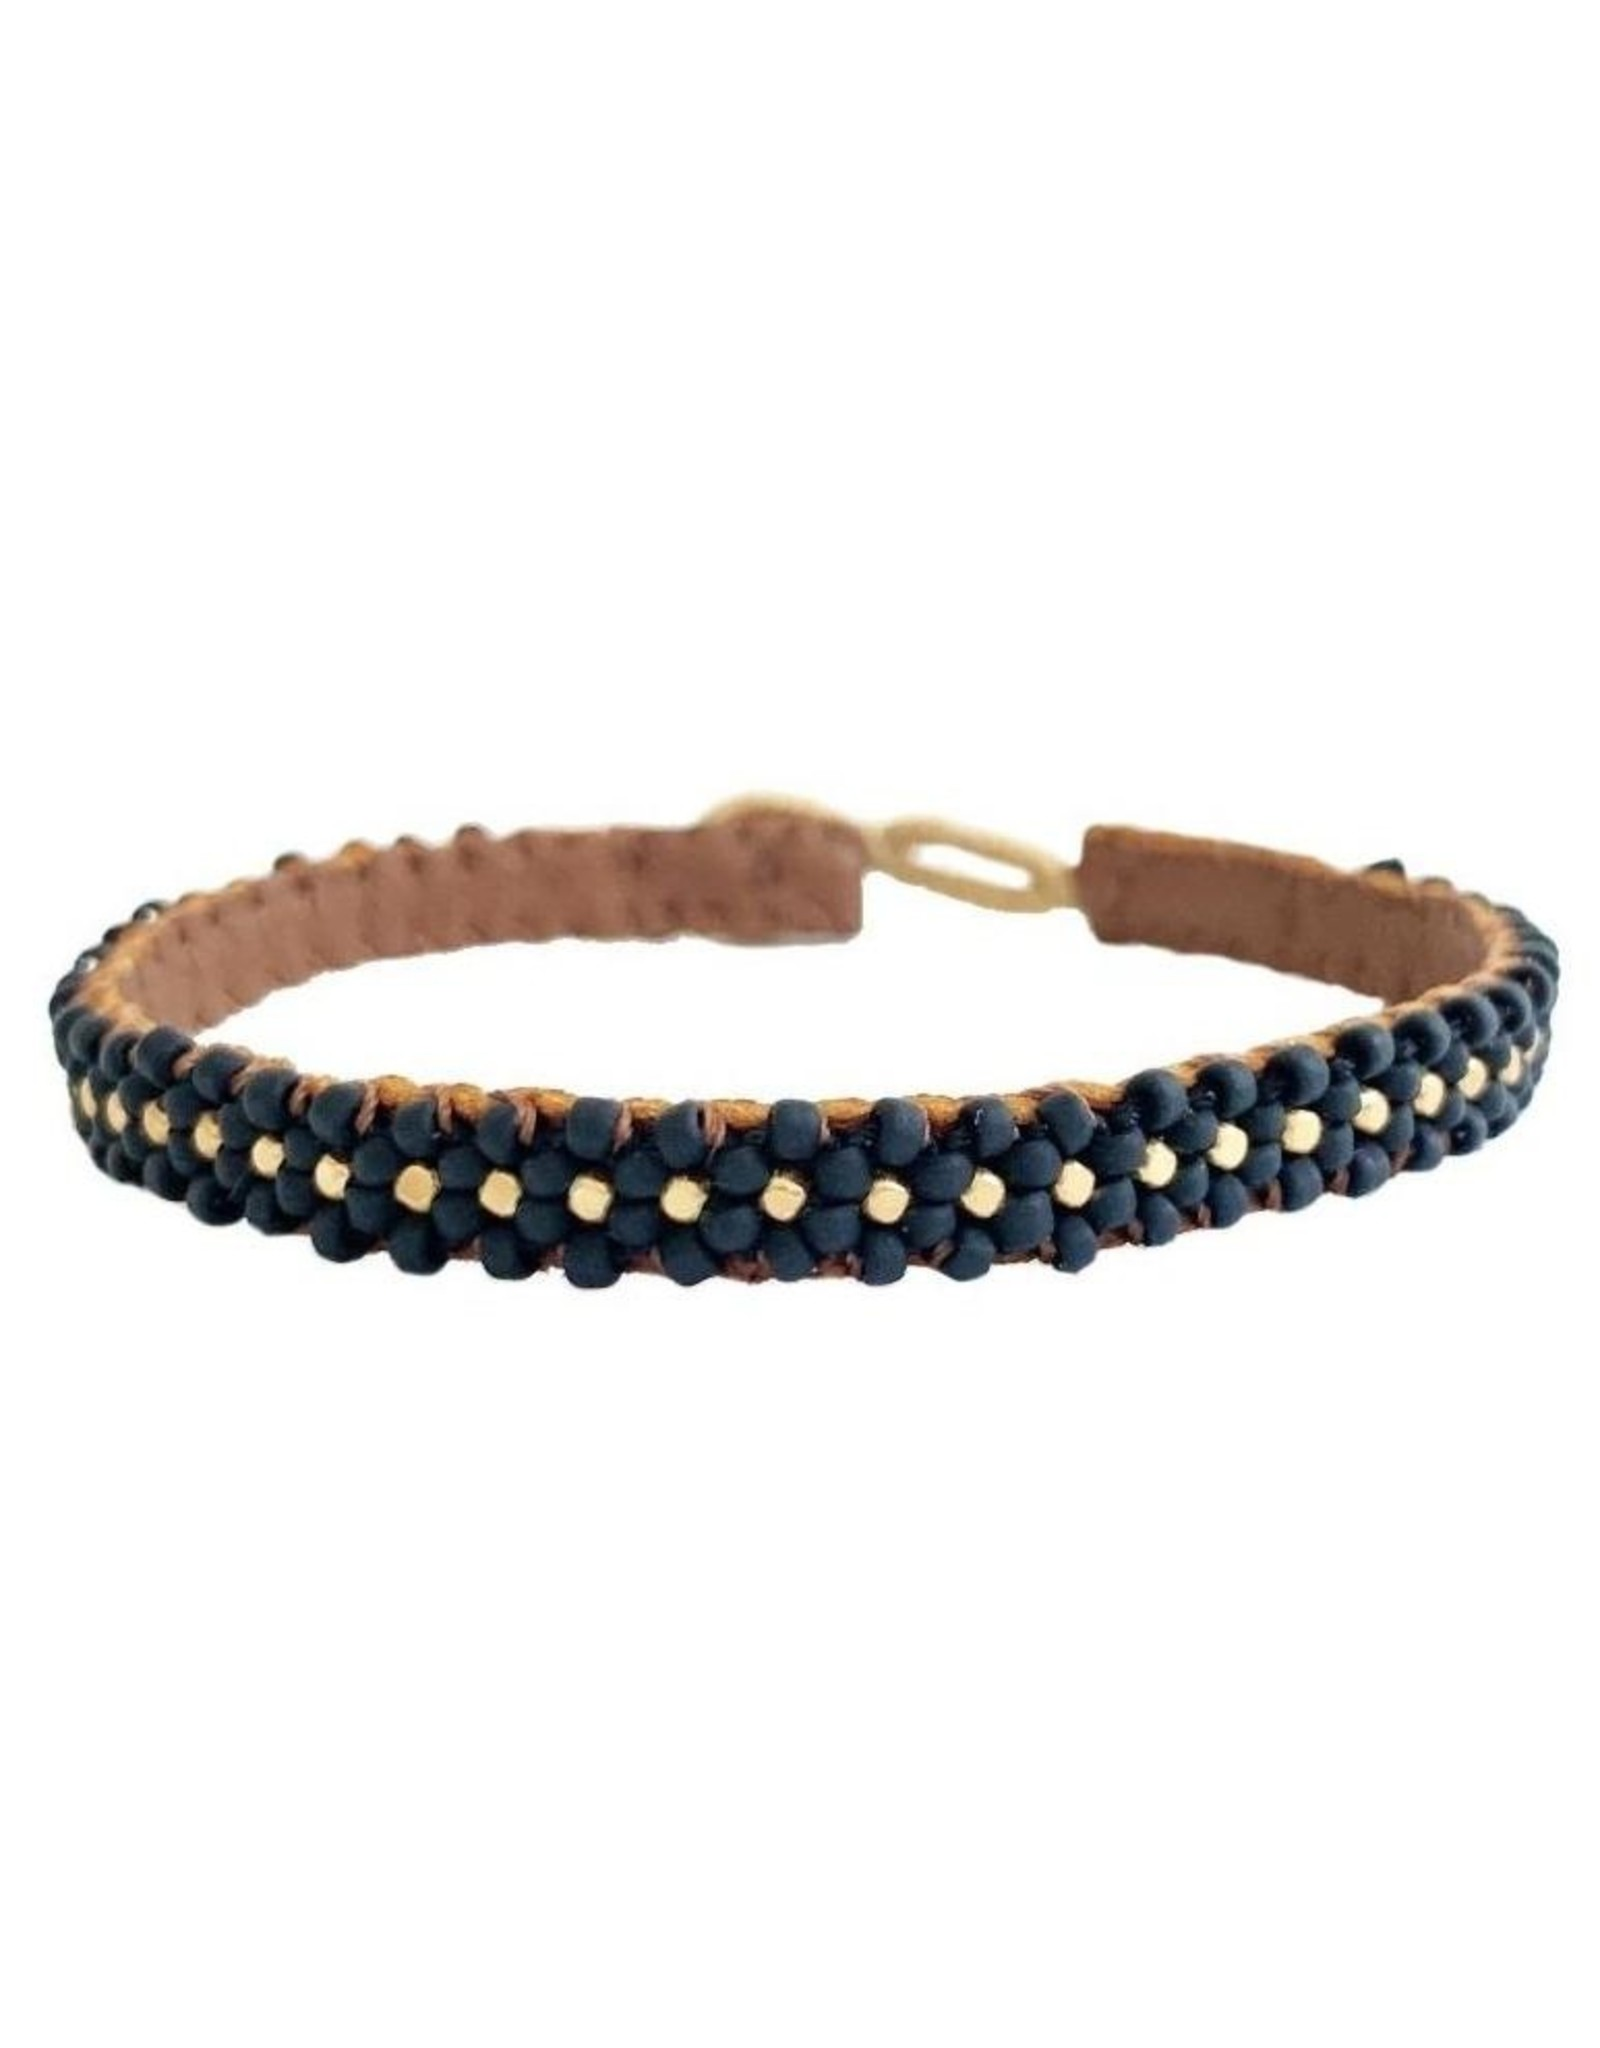 Ibu jewels armband lace ibu juwels